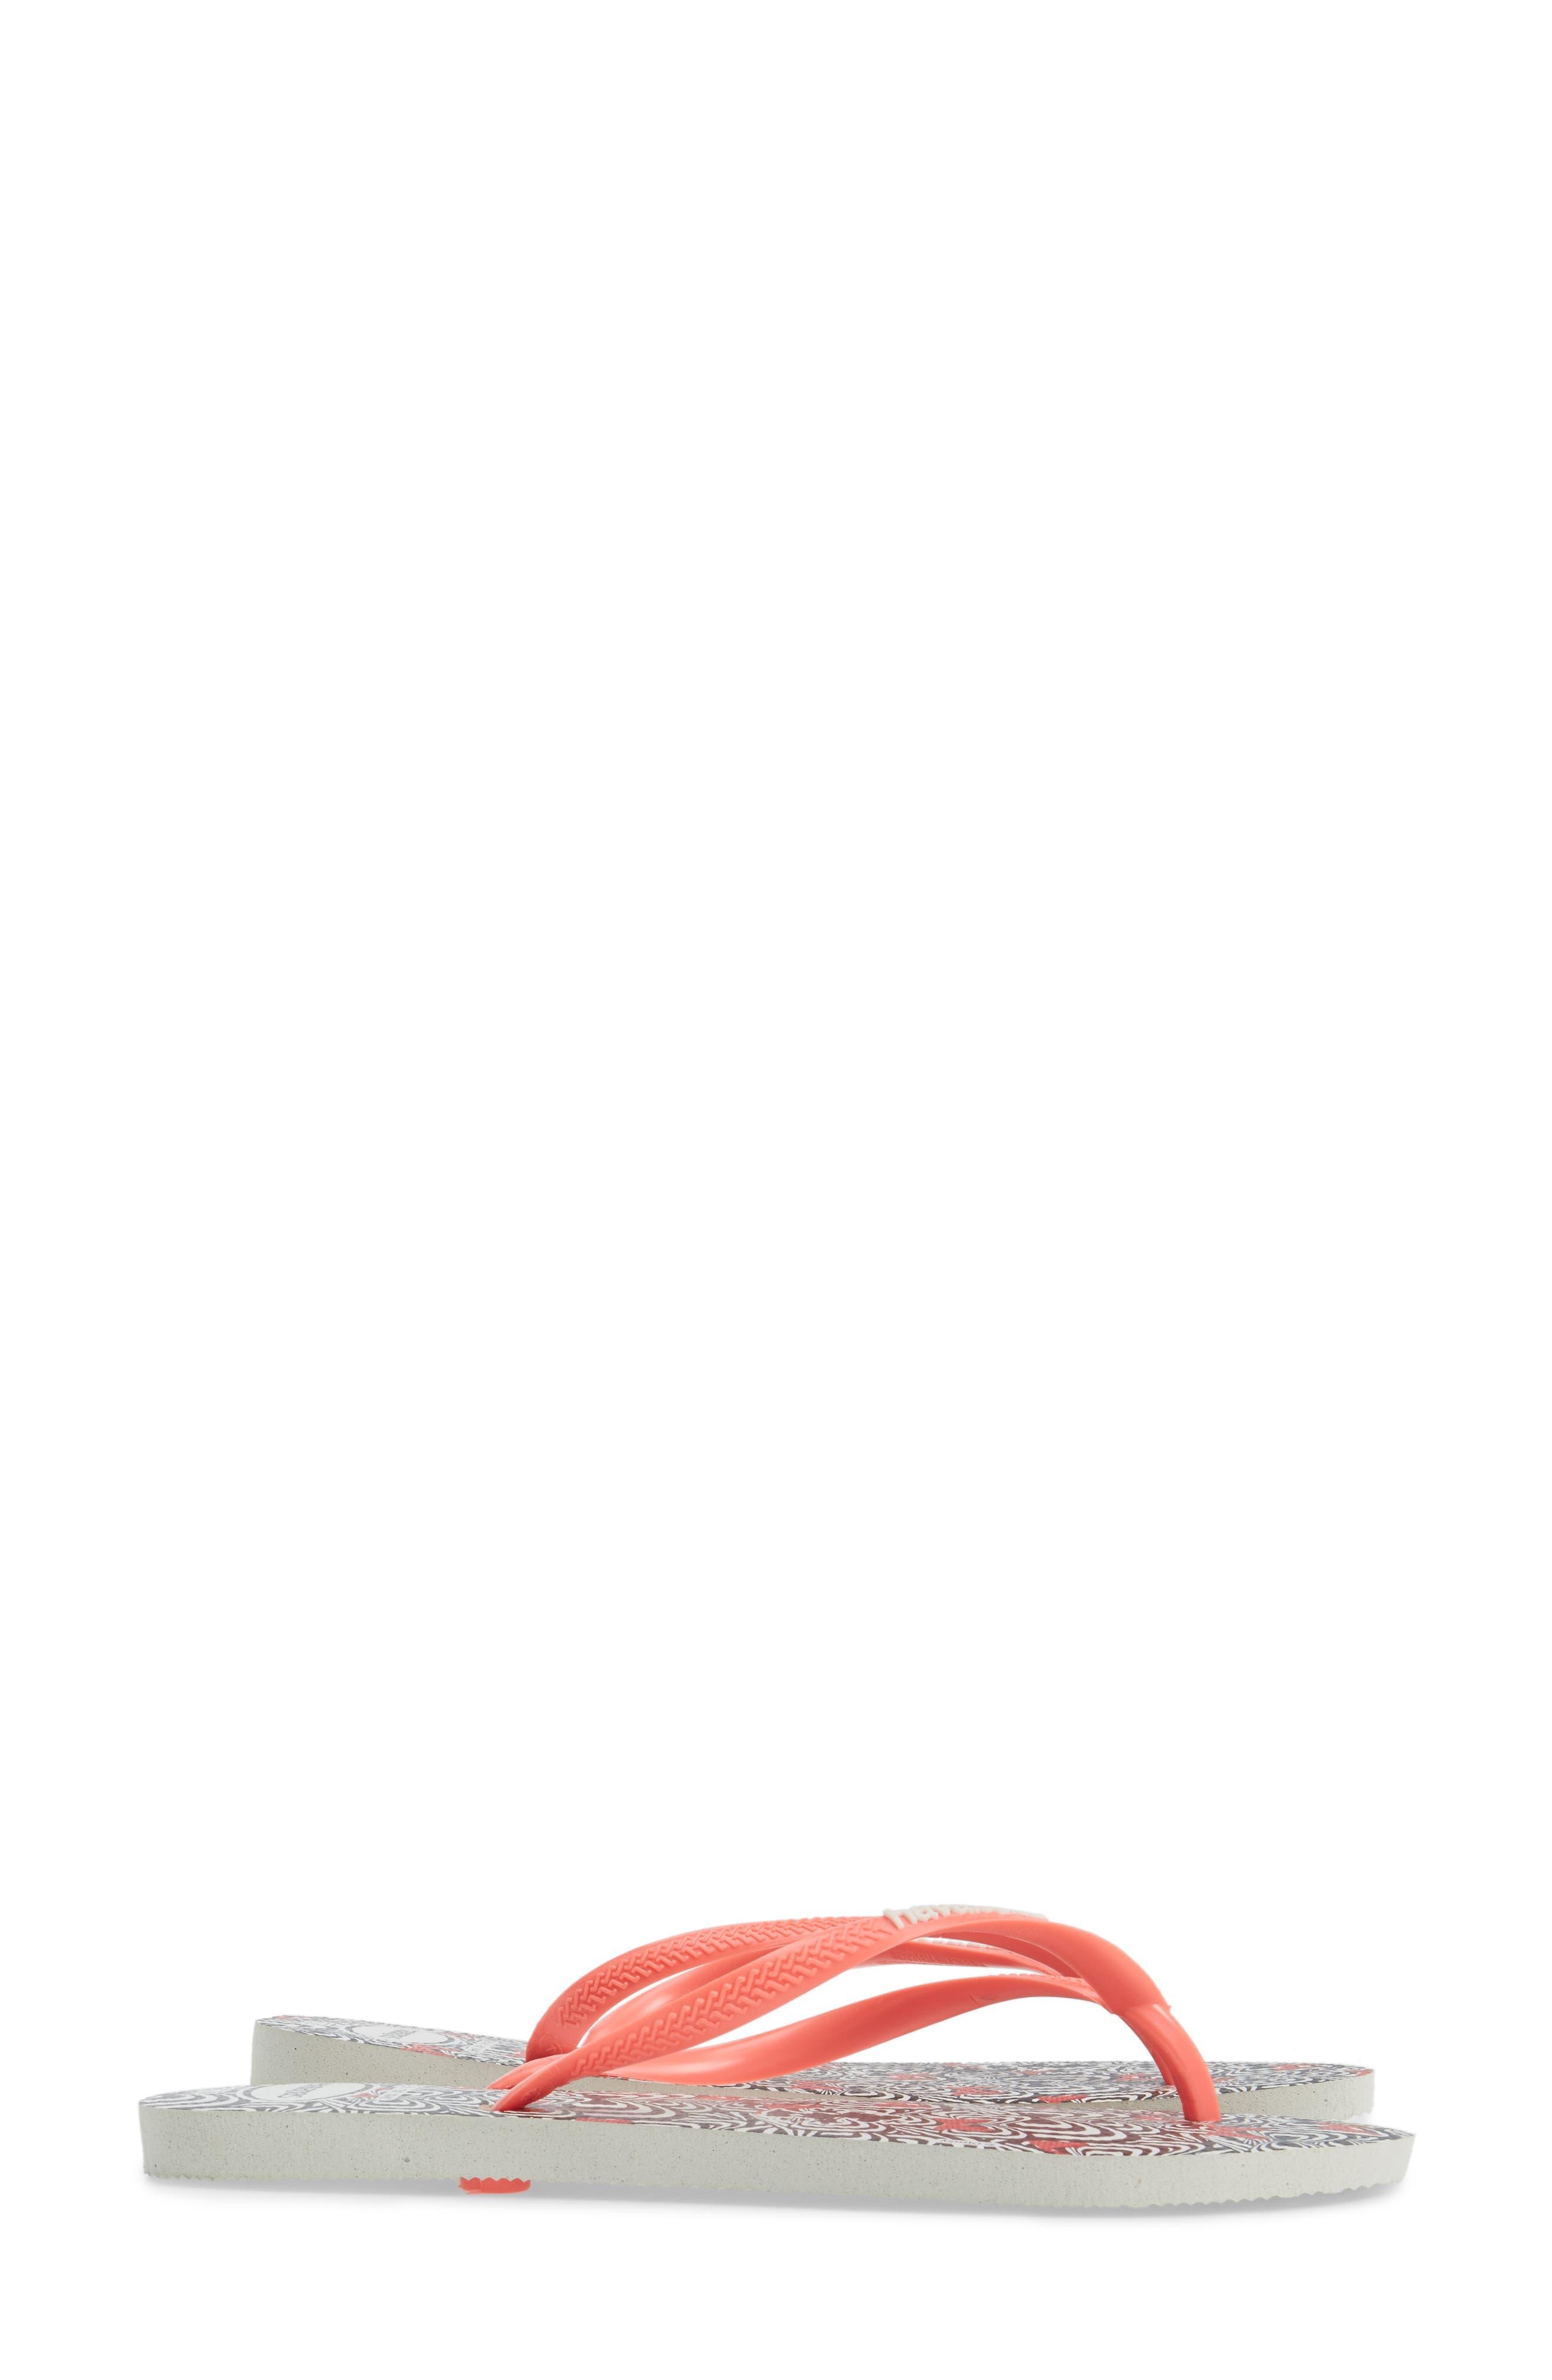 Slim Millennial Disney Thematic Flip Flop,                             Alternate thumbnail 11, color,